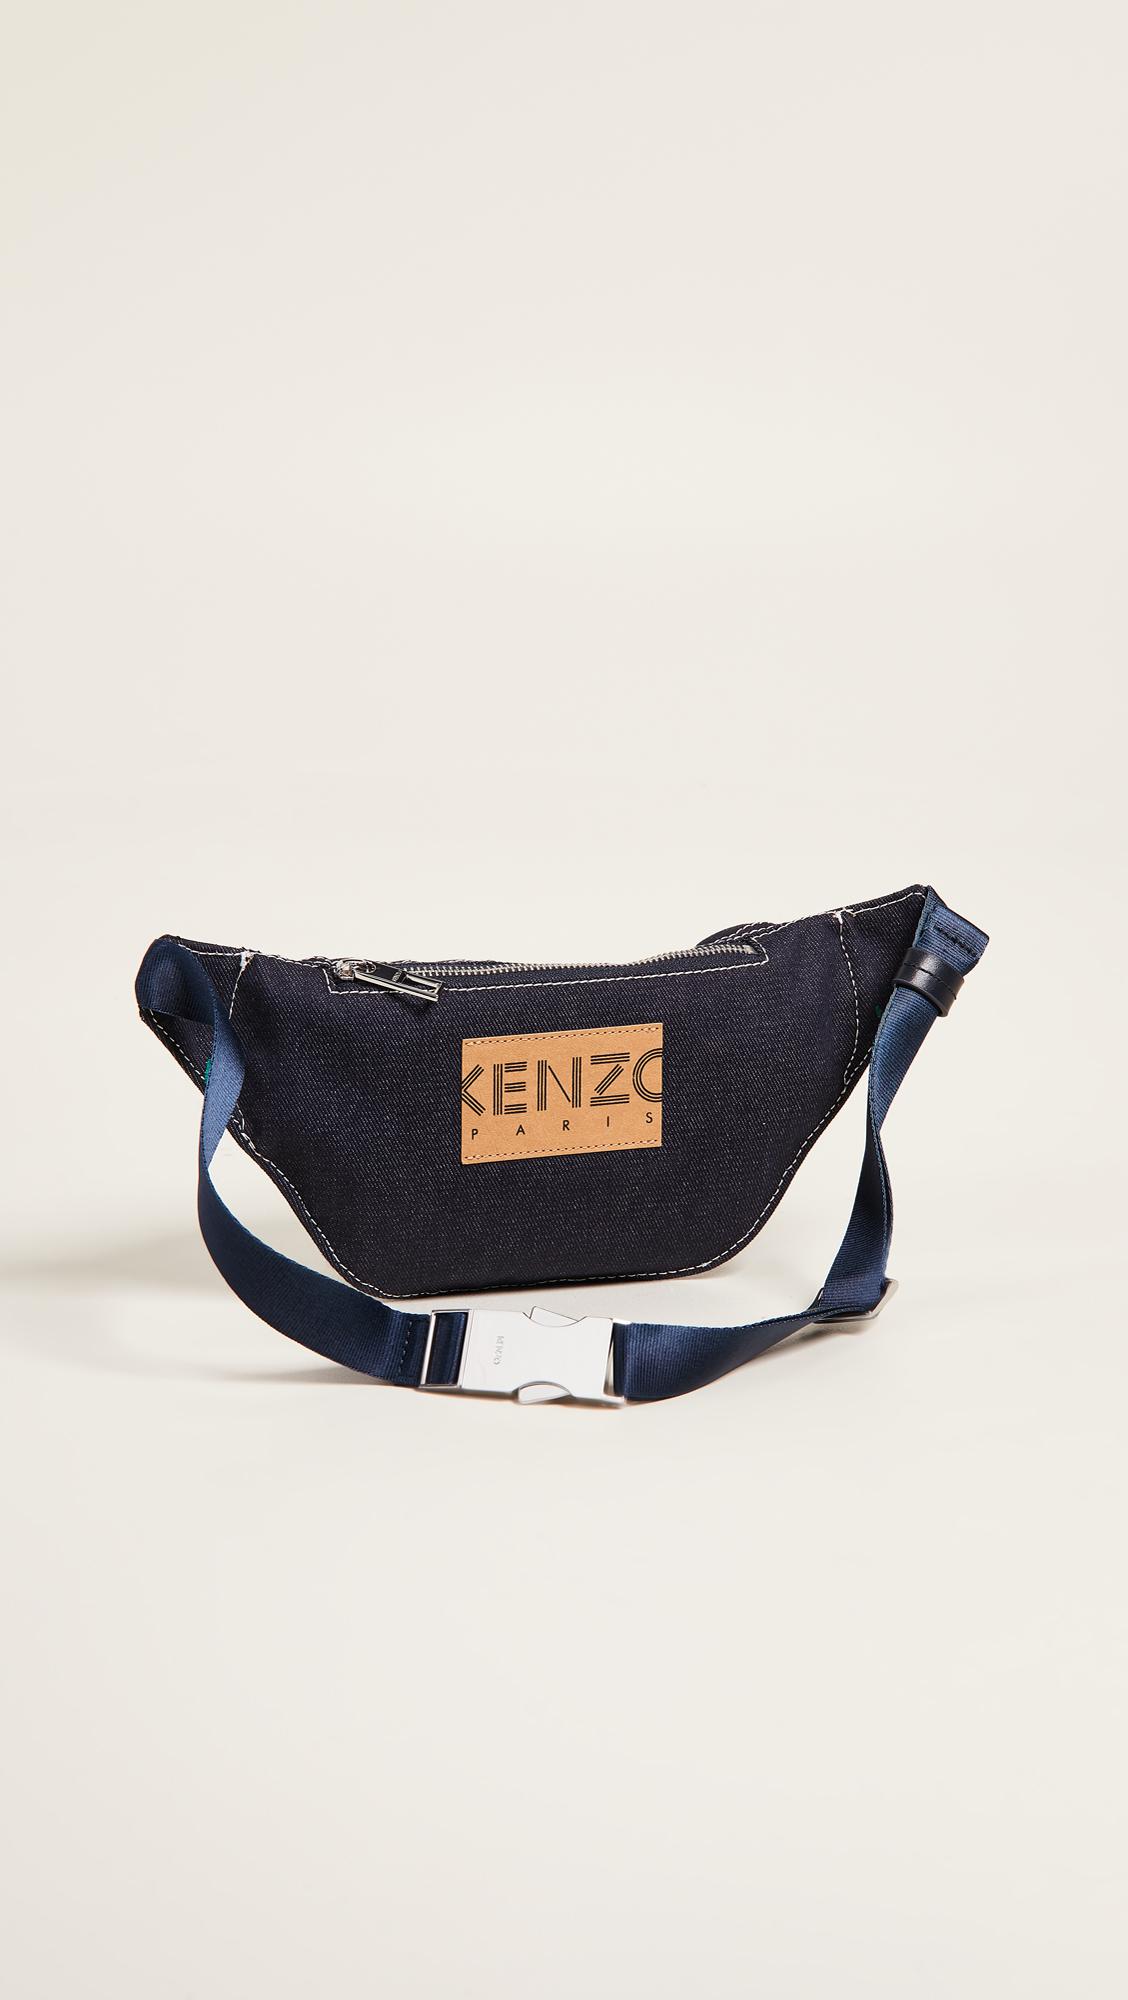 4b4dca0f2154 KENZO Belt Bag   SHOPBOP